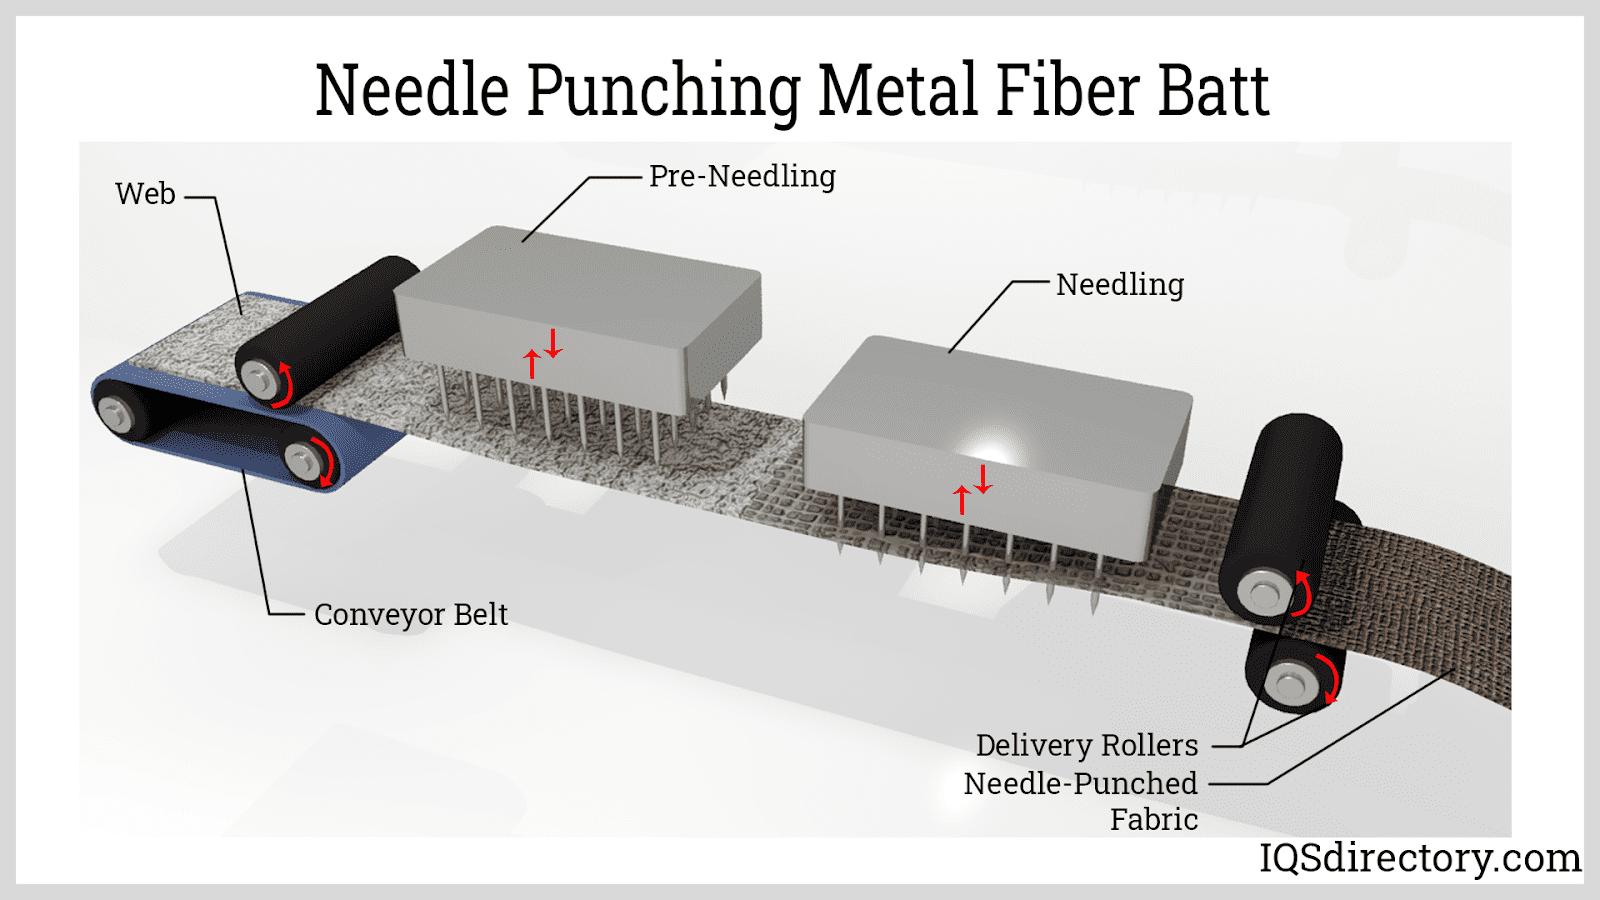 Needle Punching Metal Fiber Batt